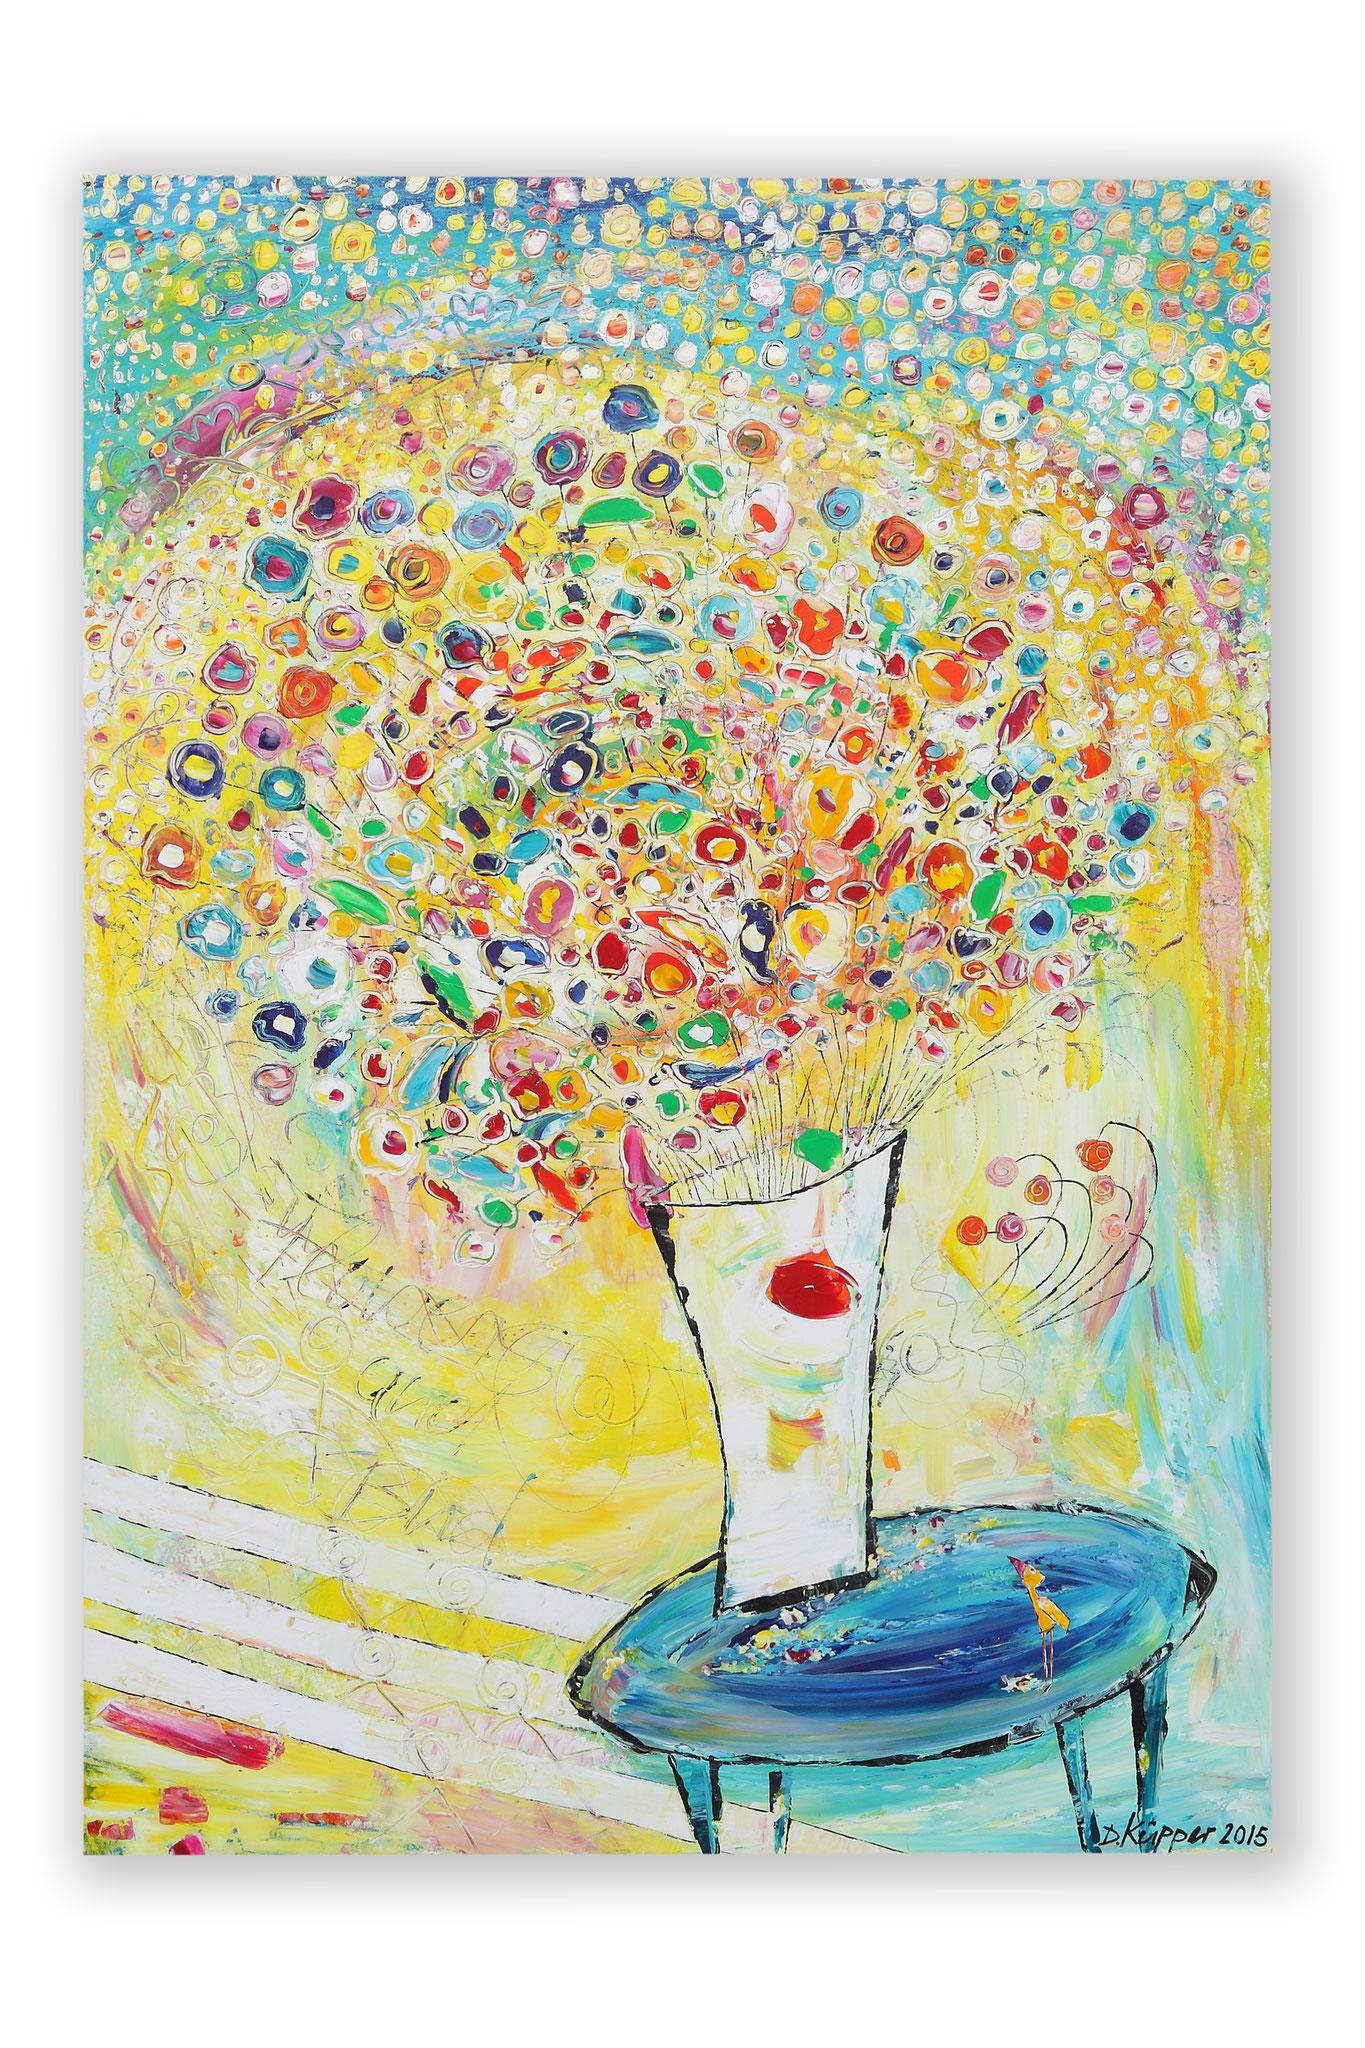 """Flowers & Bird"" - 70x100cm - Preis: 320 Euro"